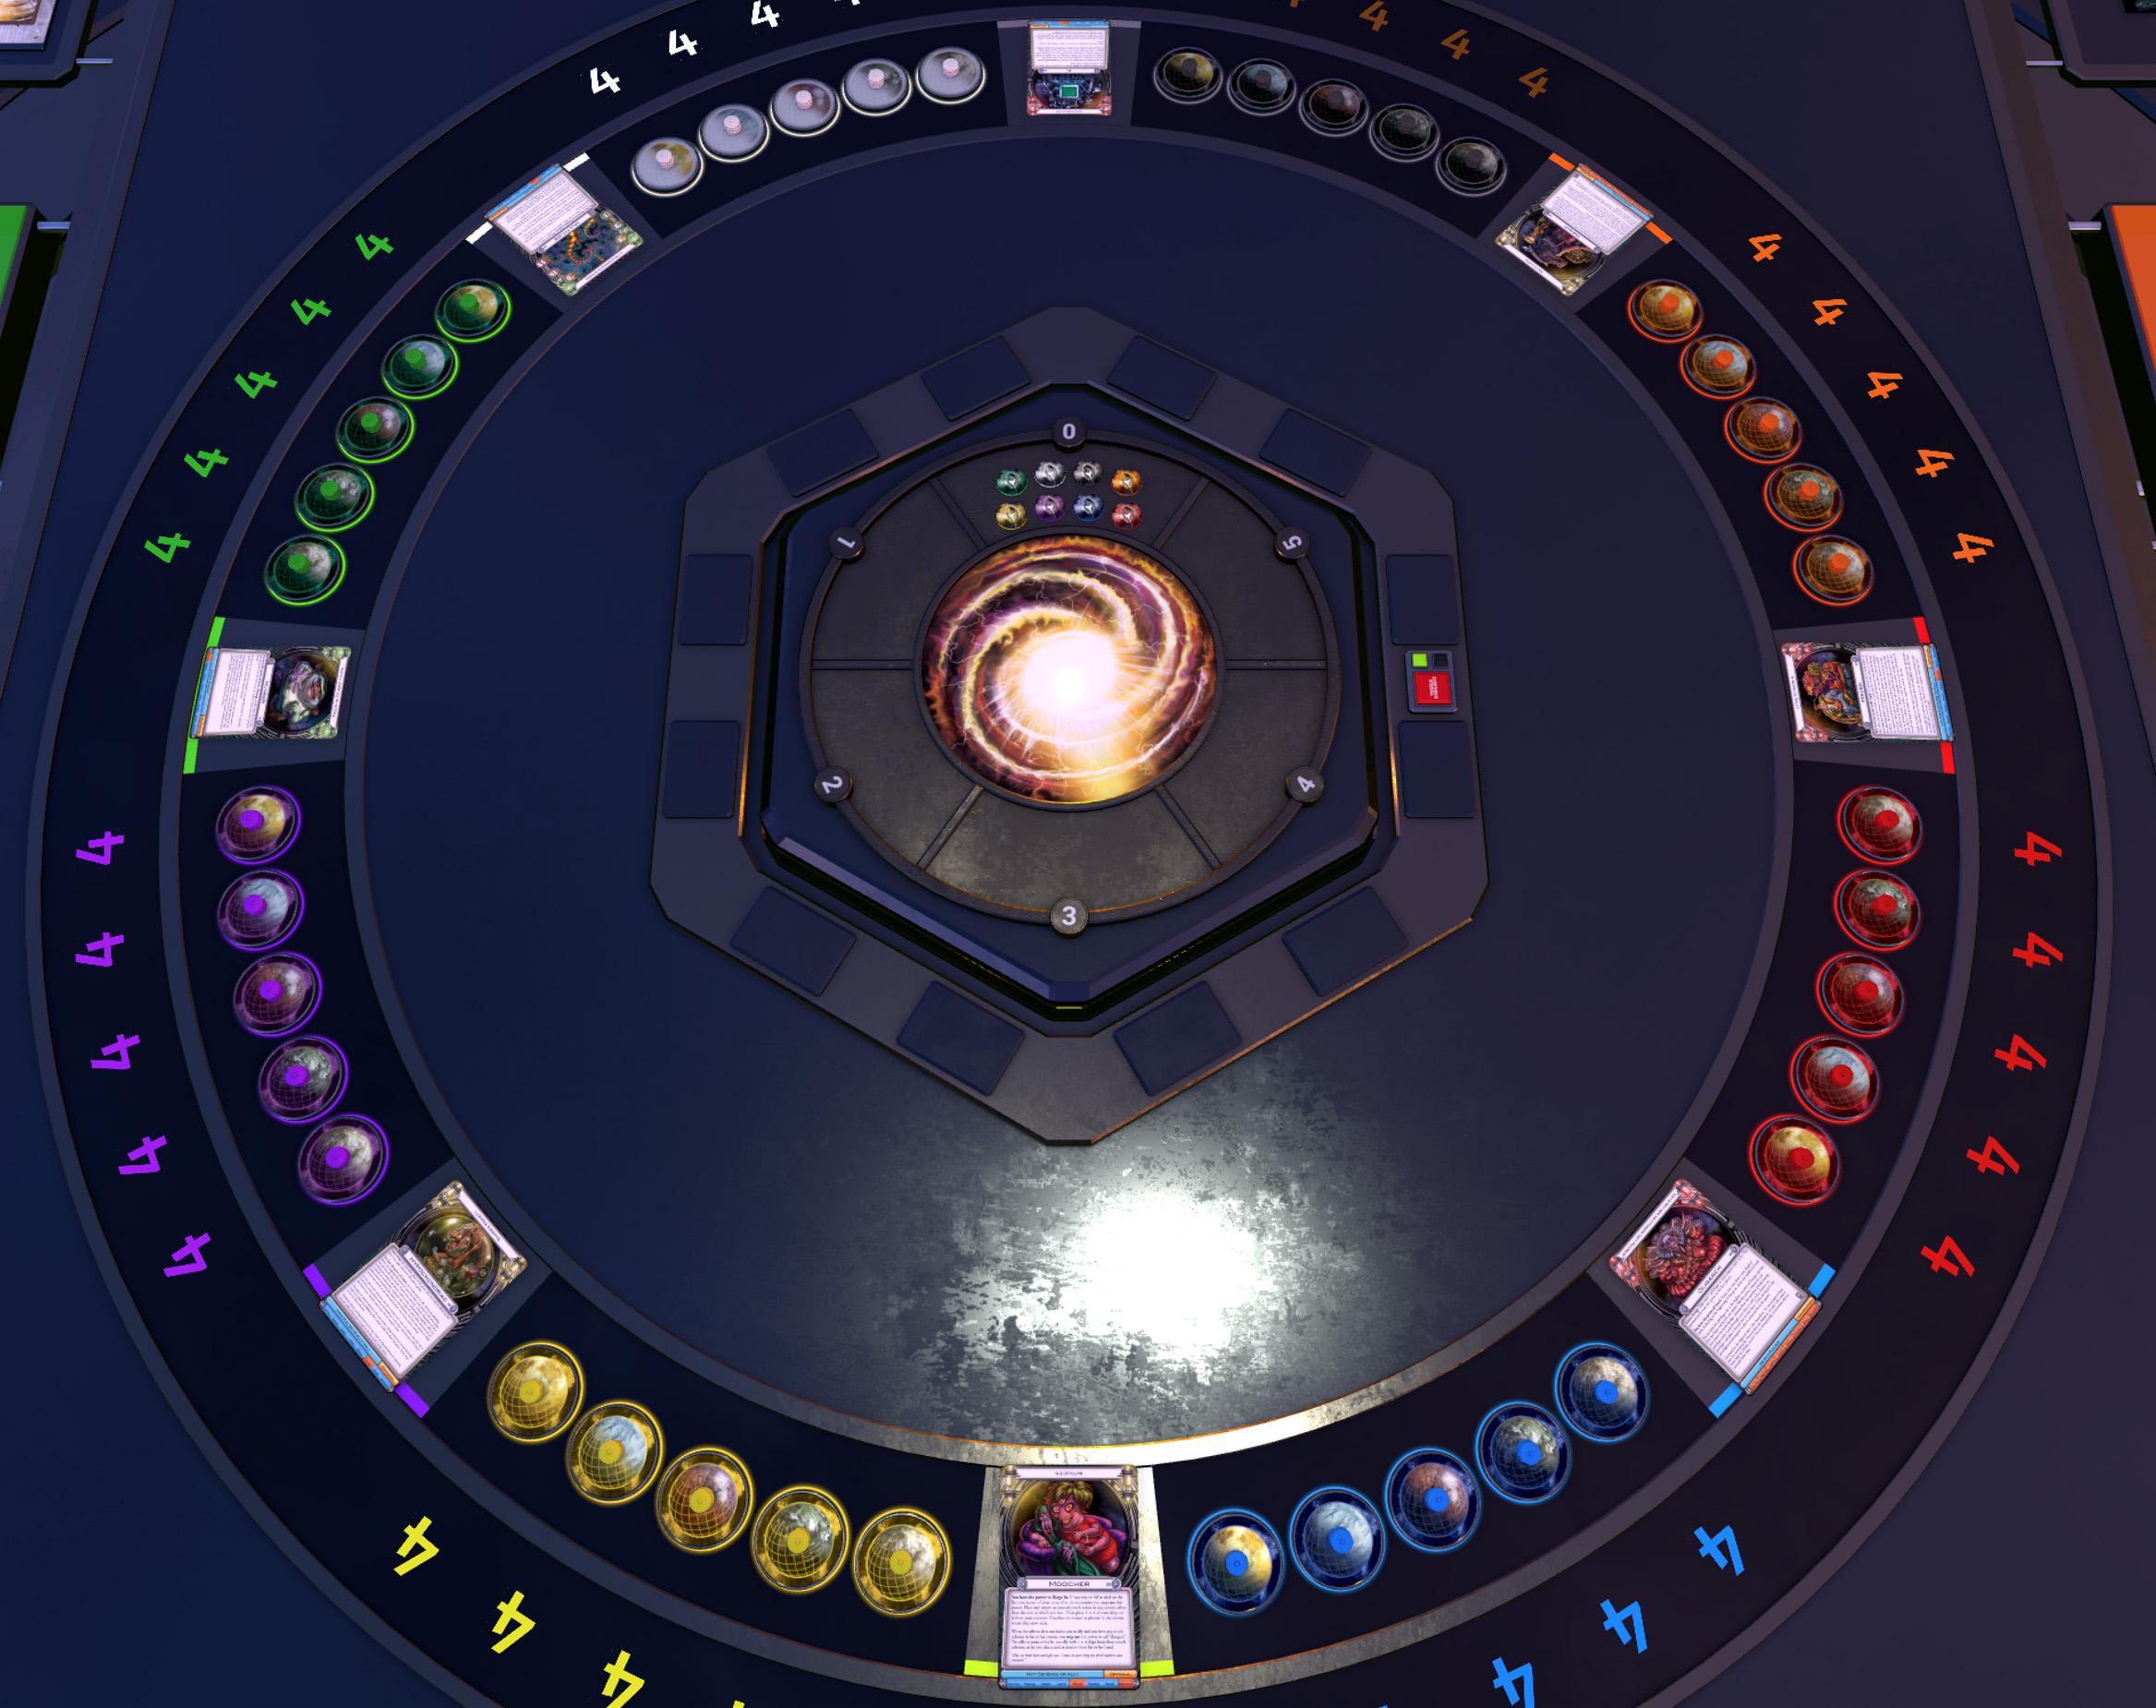 playnow-gamesetup3.jpg